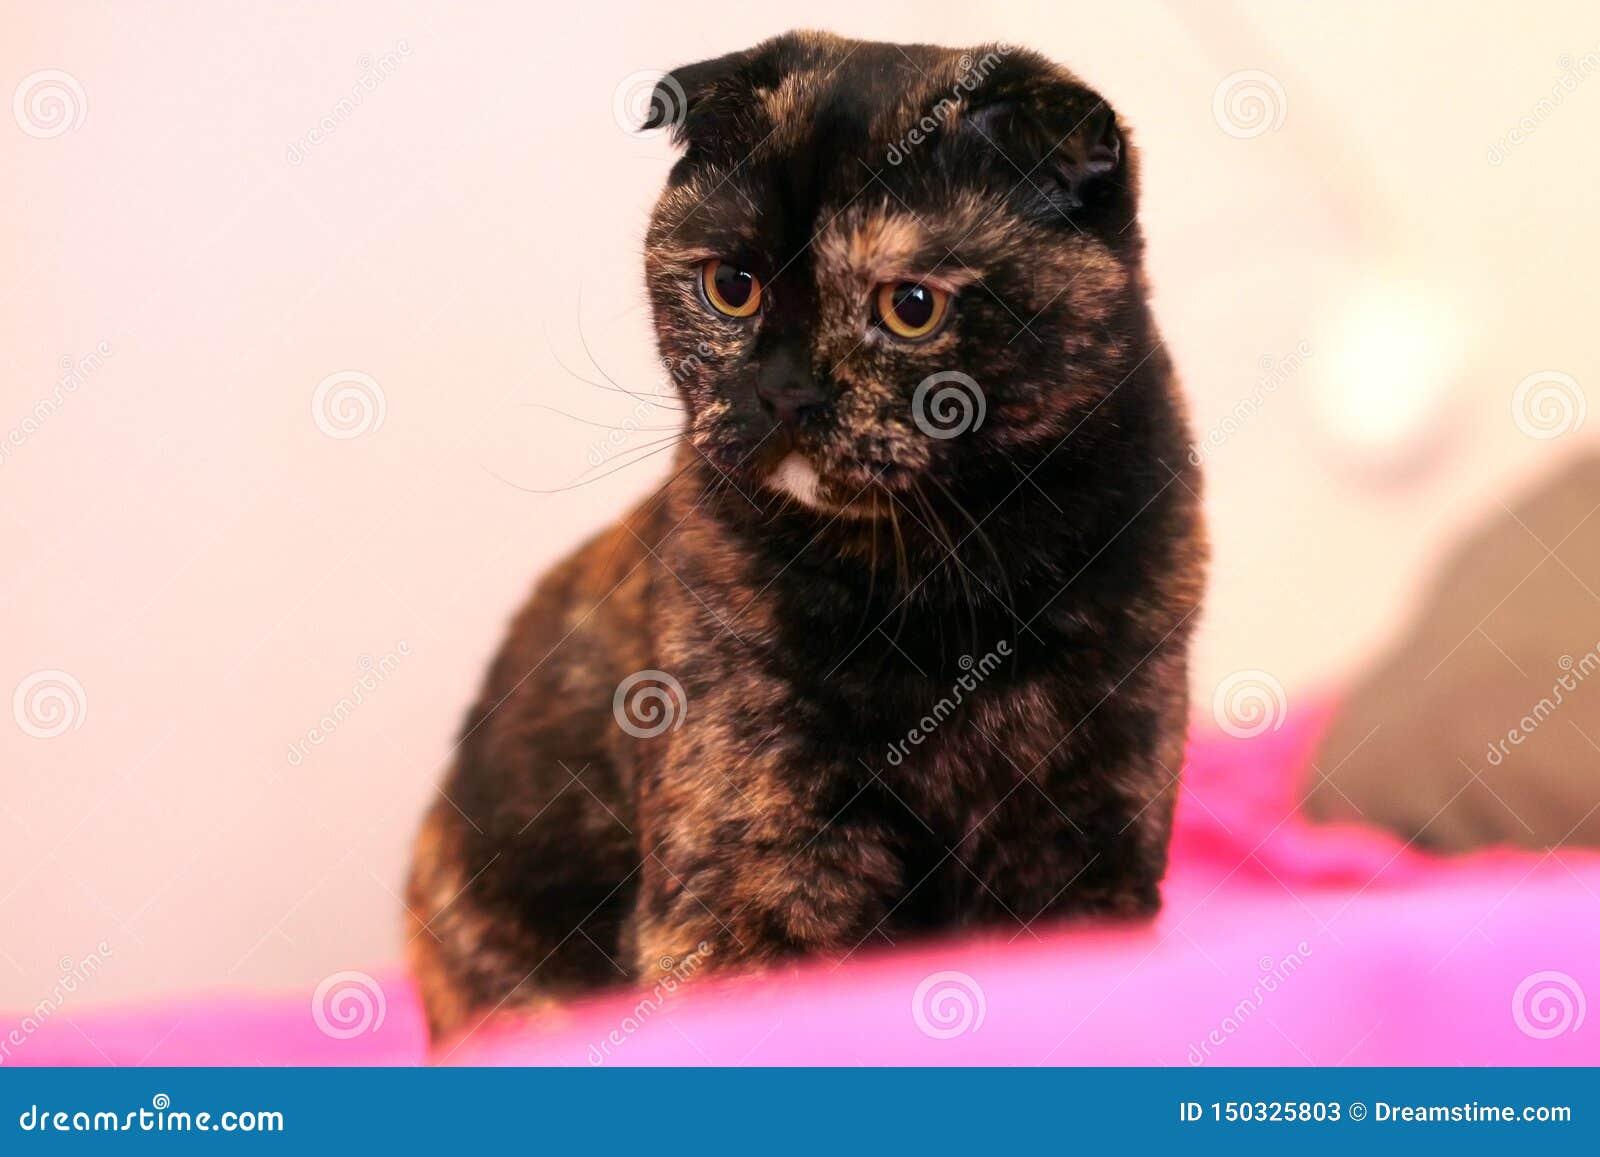 Scottish fold tortoiseshell cat sitting on the bed on a pink blanket